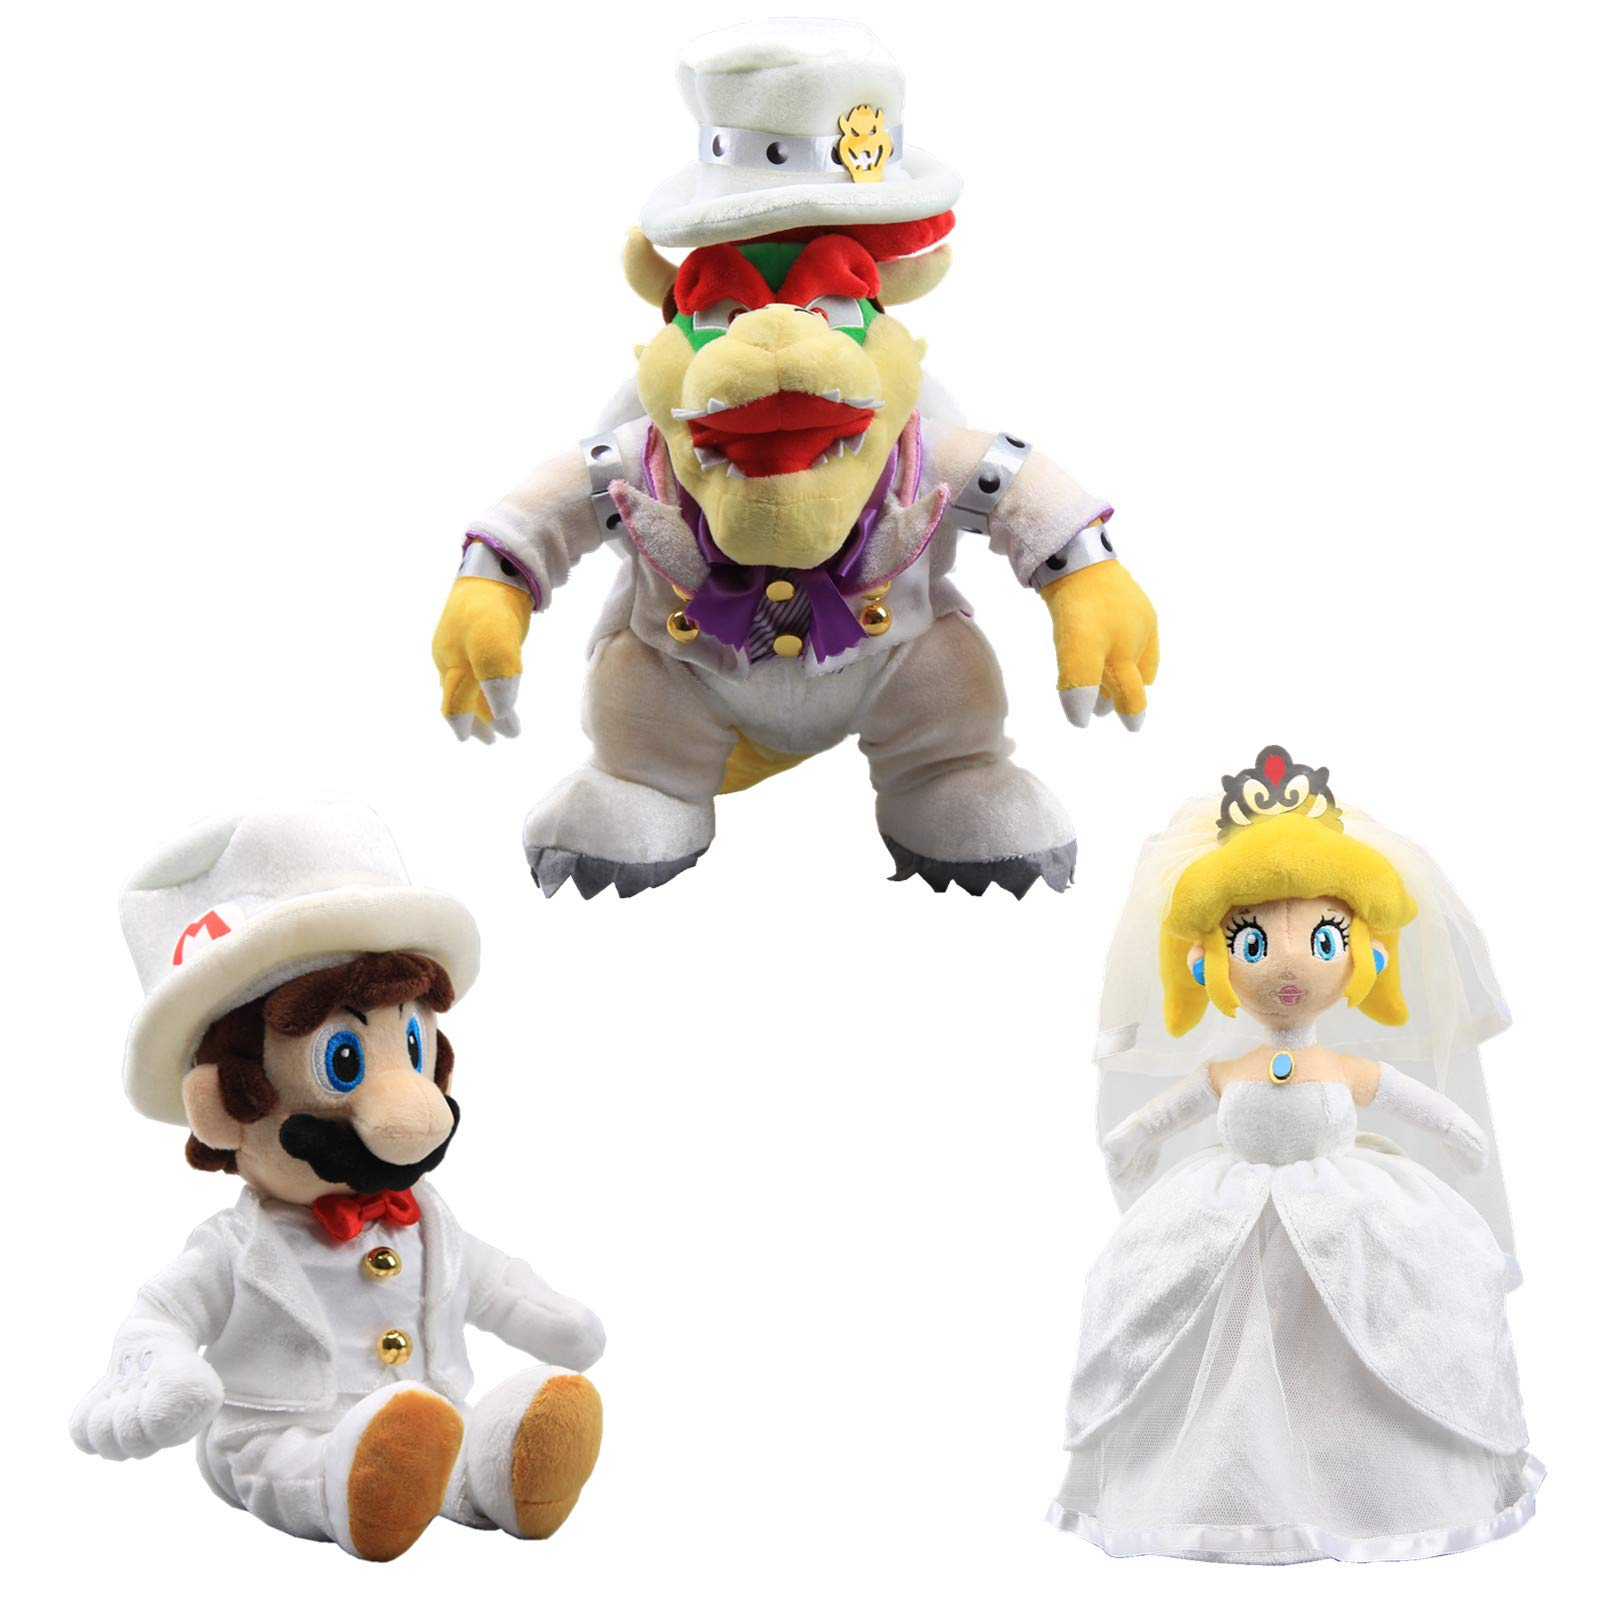 uiuoutoy Super Mario Odyssey King Bowser Princess Peach Mario Wedding Dress Plush Toy Set of 3 pcs by uiuoutoy